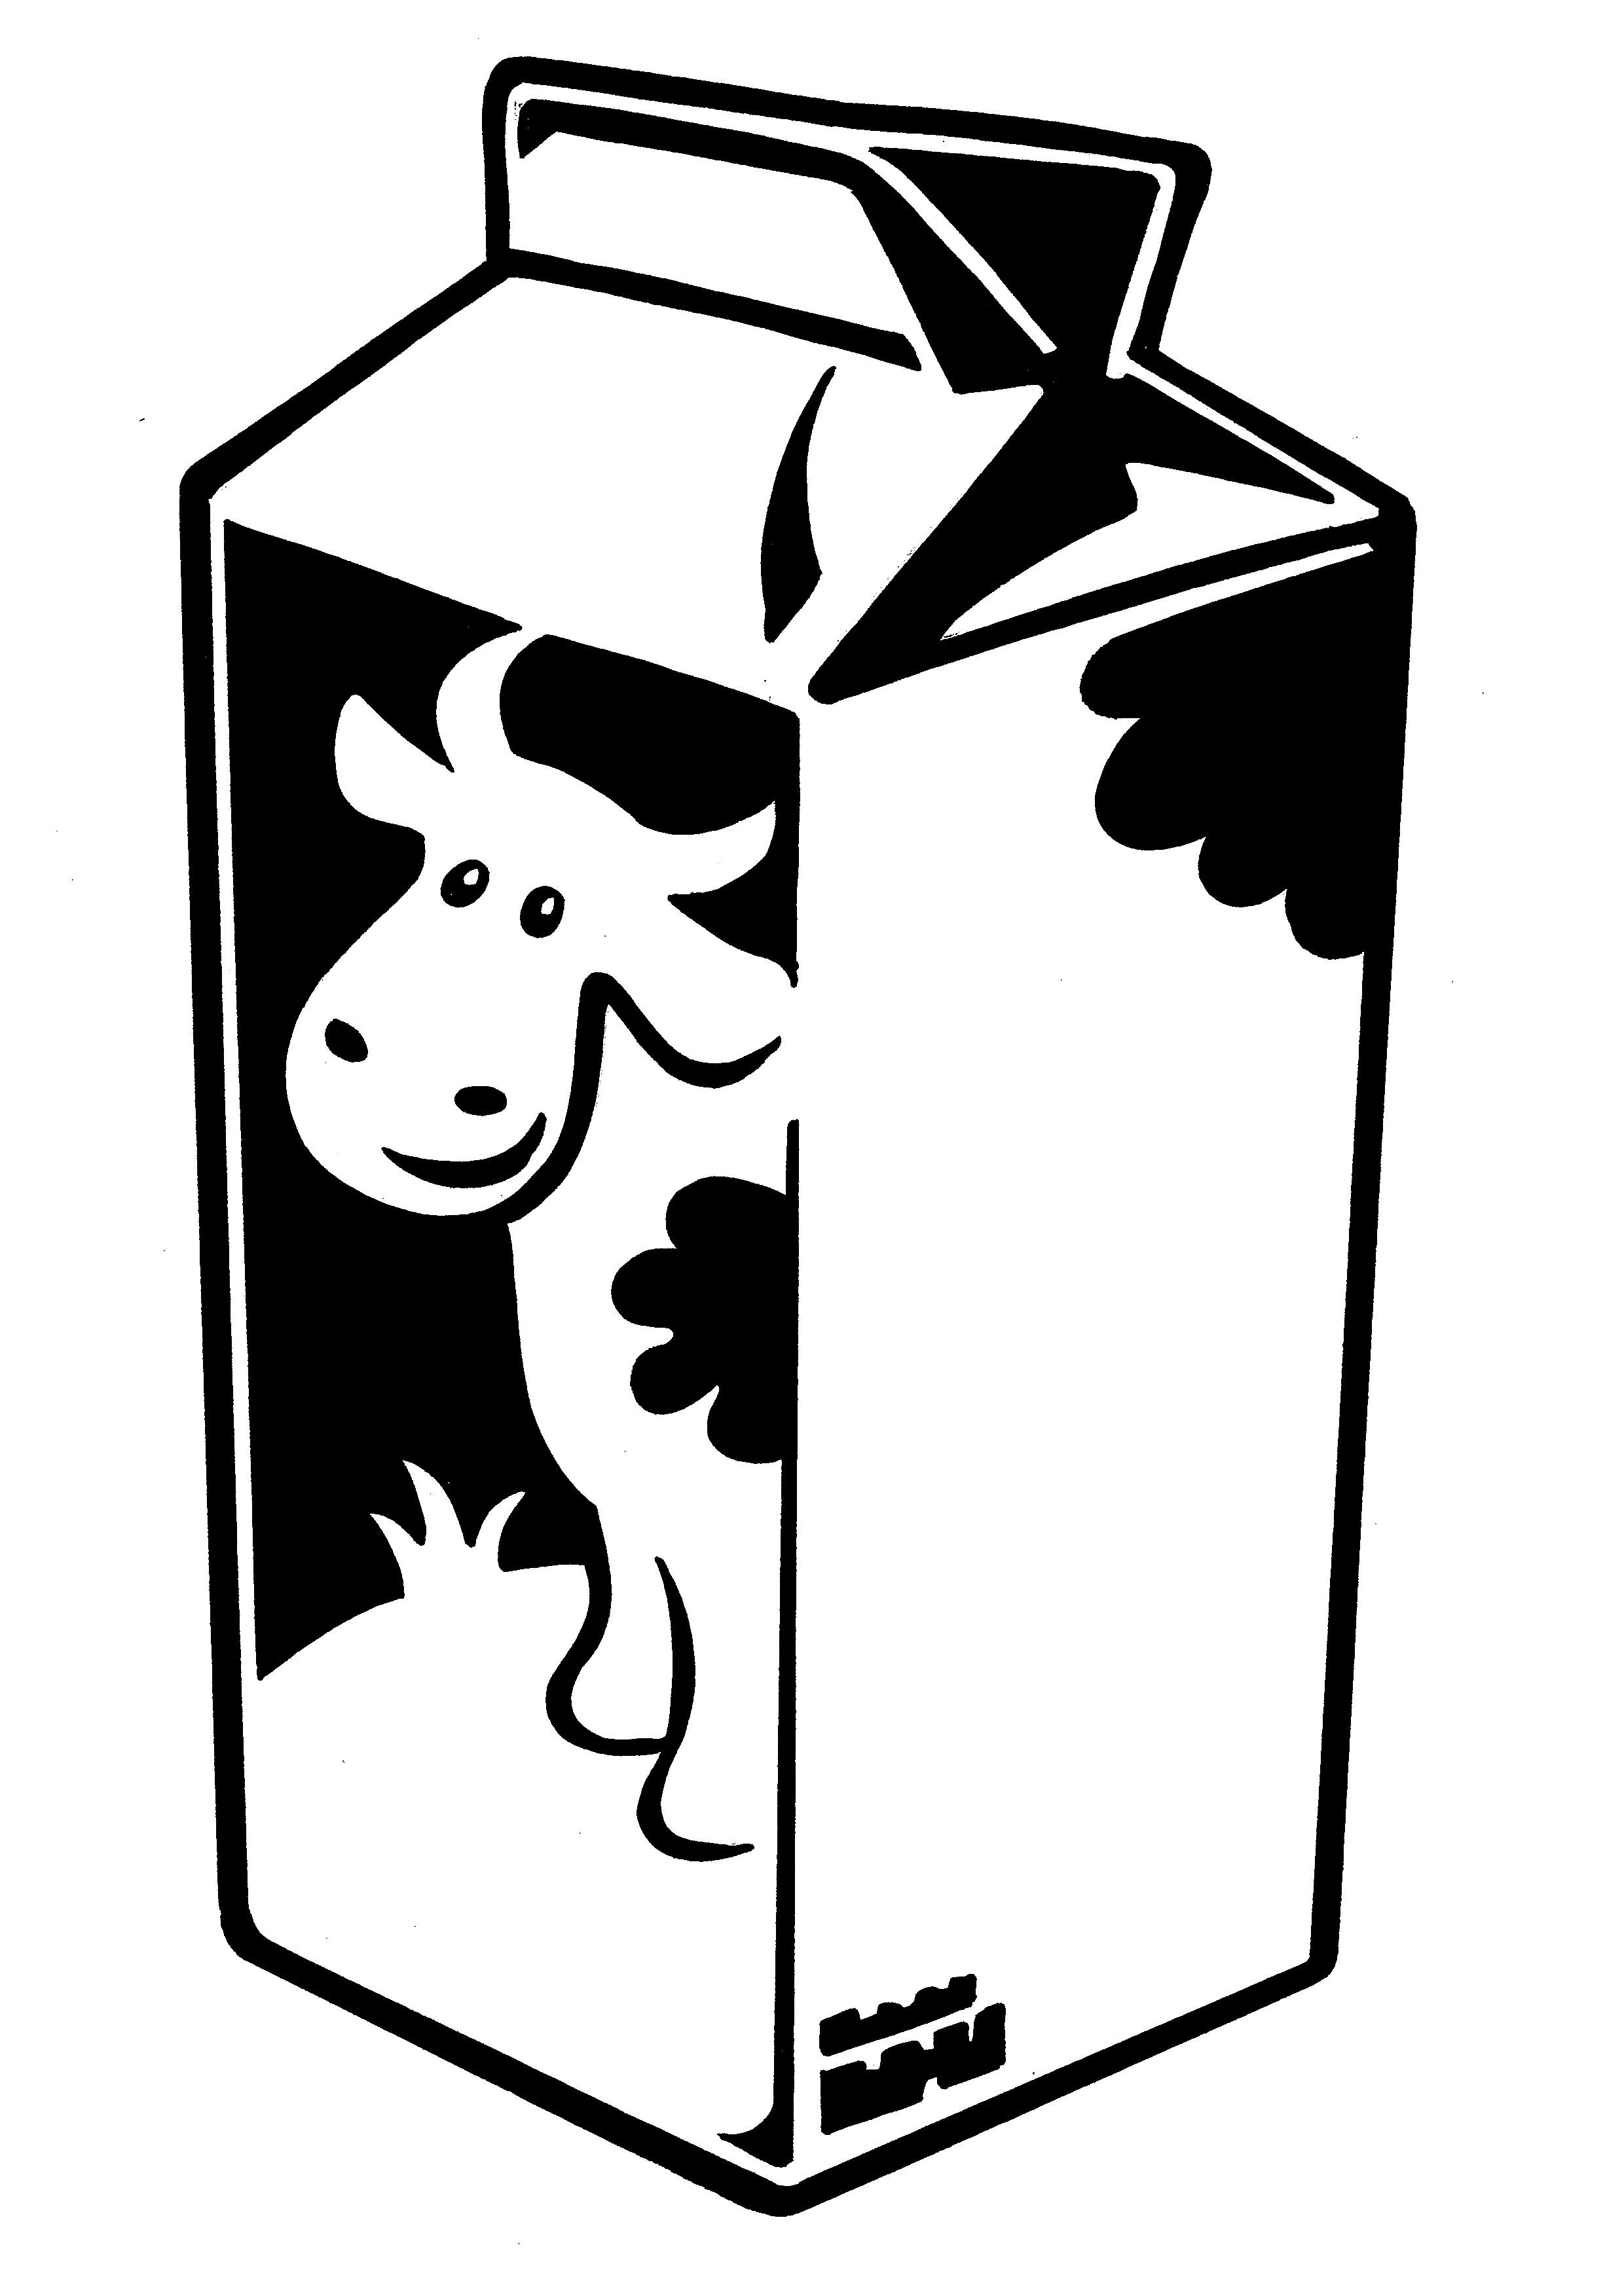 Spilled milk clipart black and white.